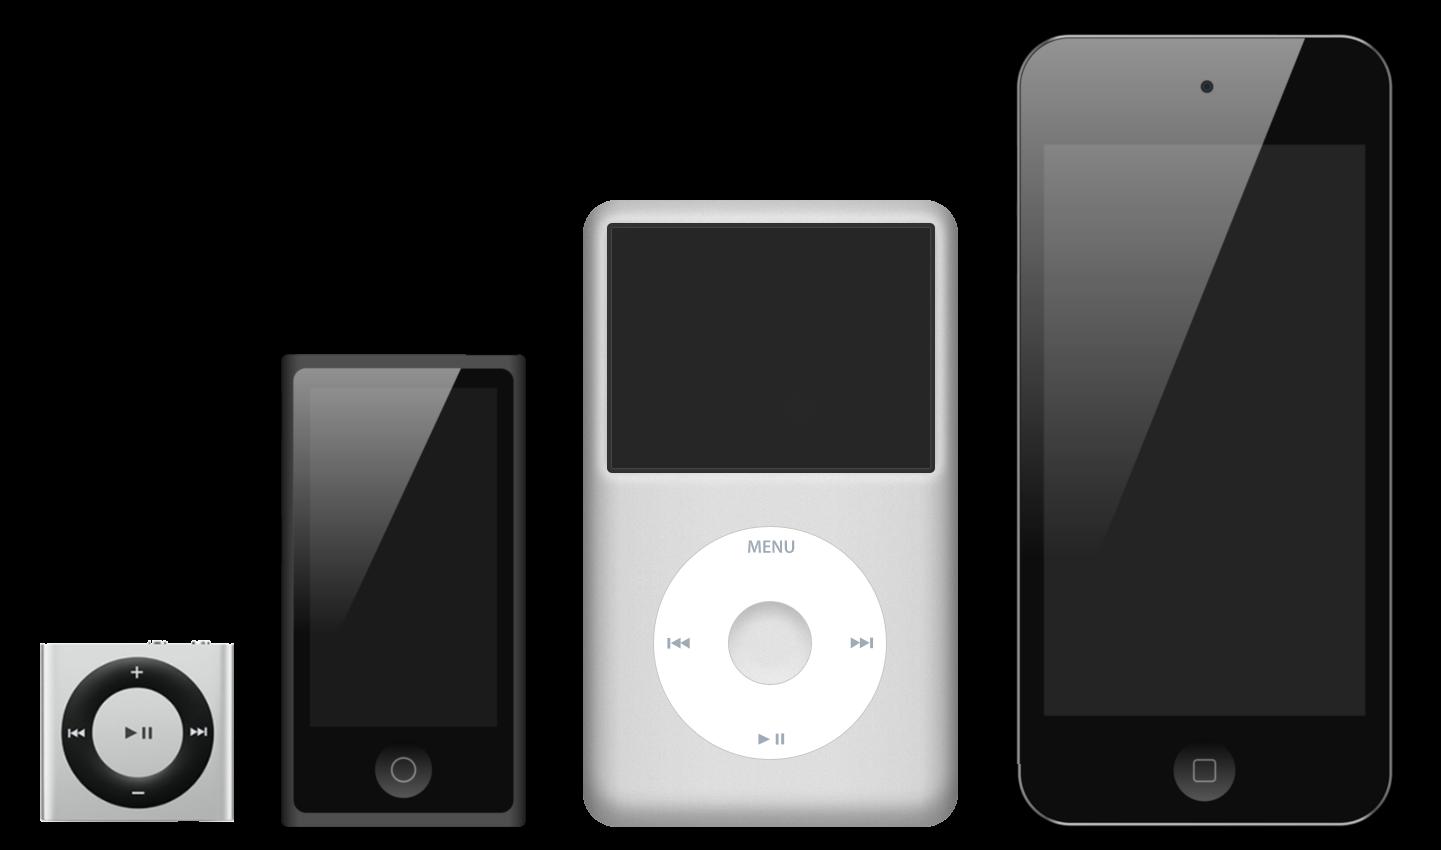 ipod-shuffle-nano-classic-touch-family-photo-combined